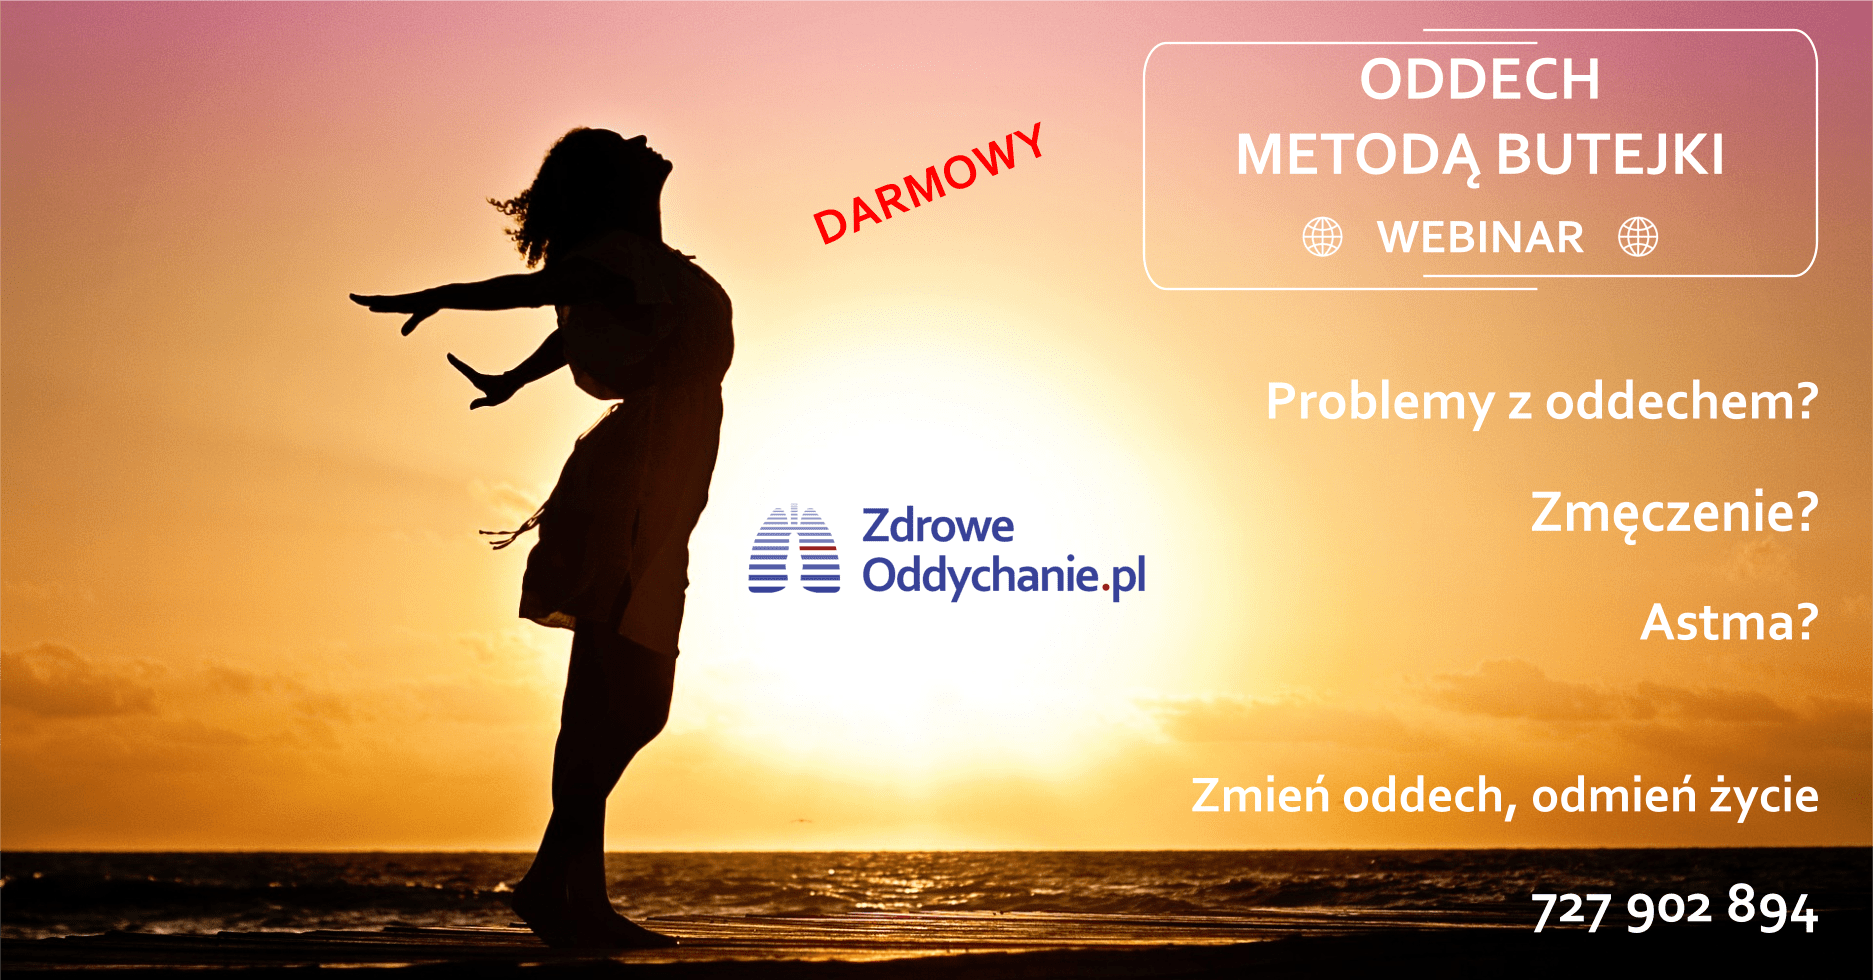 DARMOWY Webinar – oddech metodą Butejki